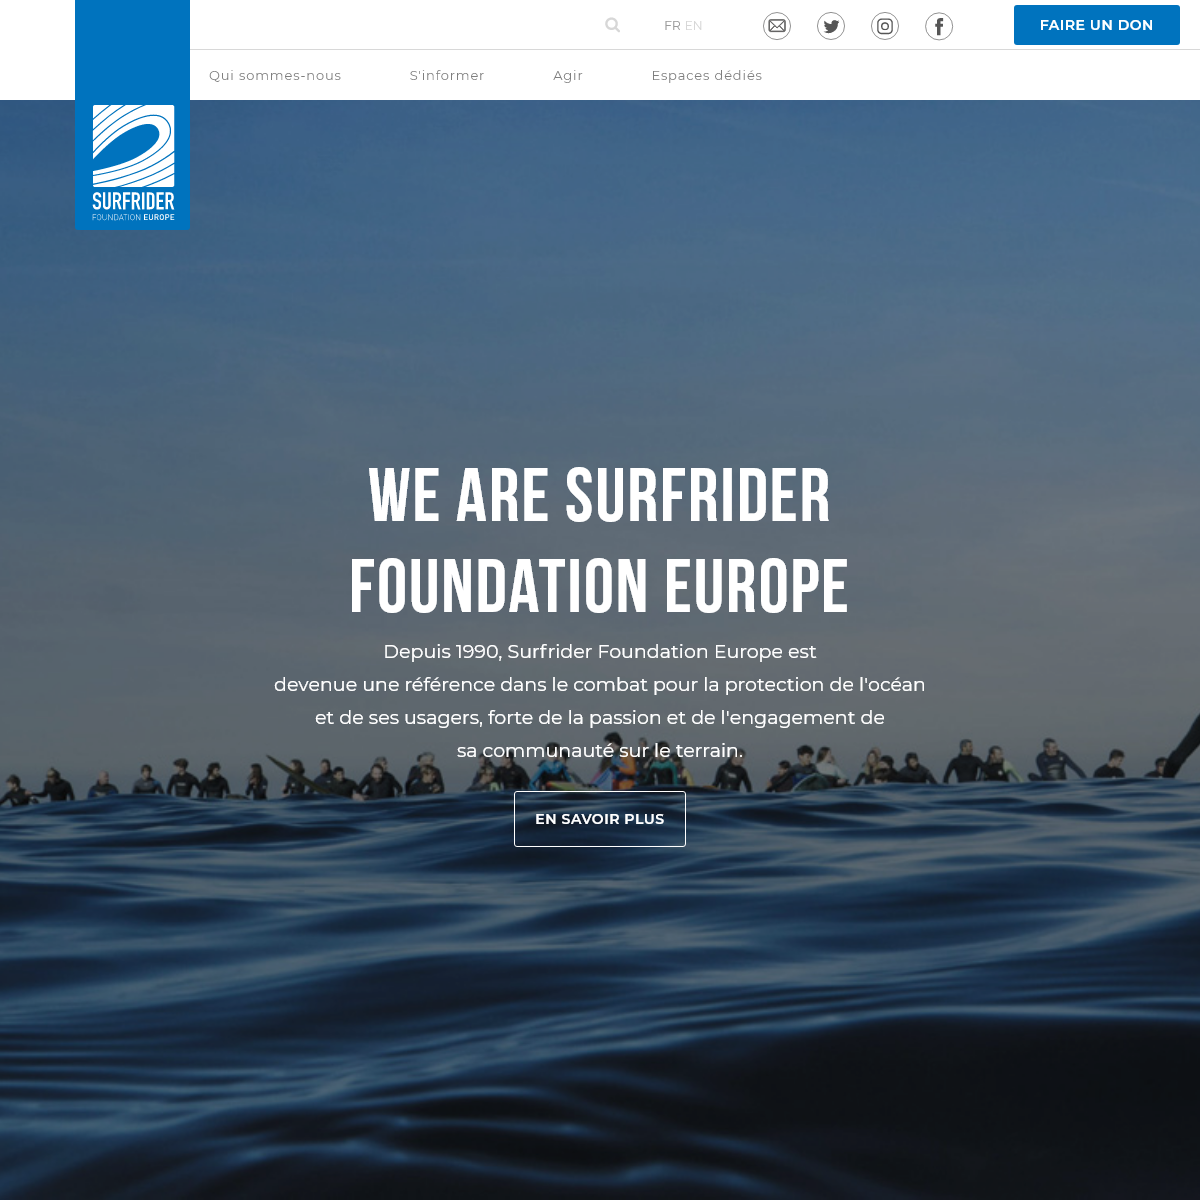 We are Surfrider Foundation Europe - Surfrider Foundation Europe